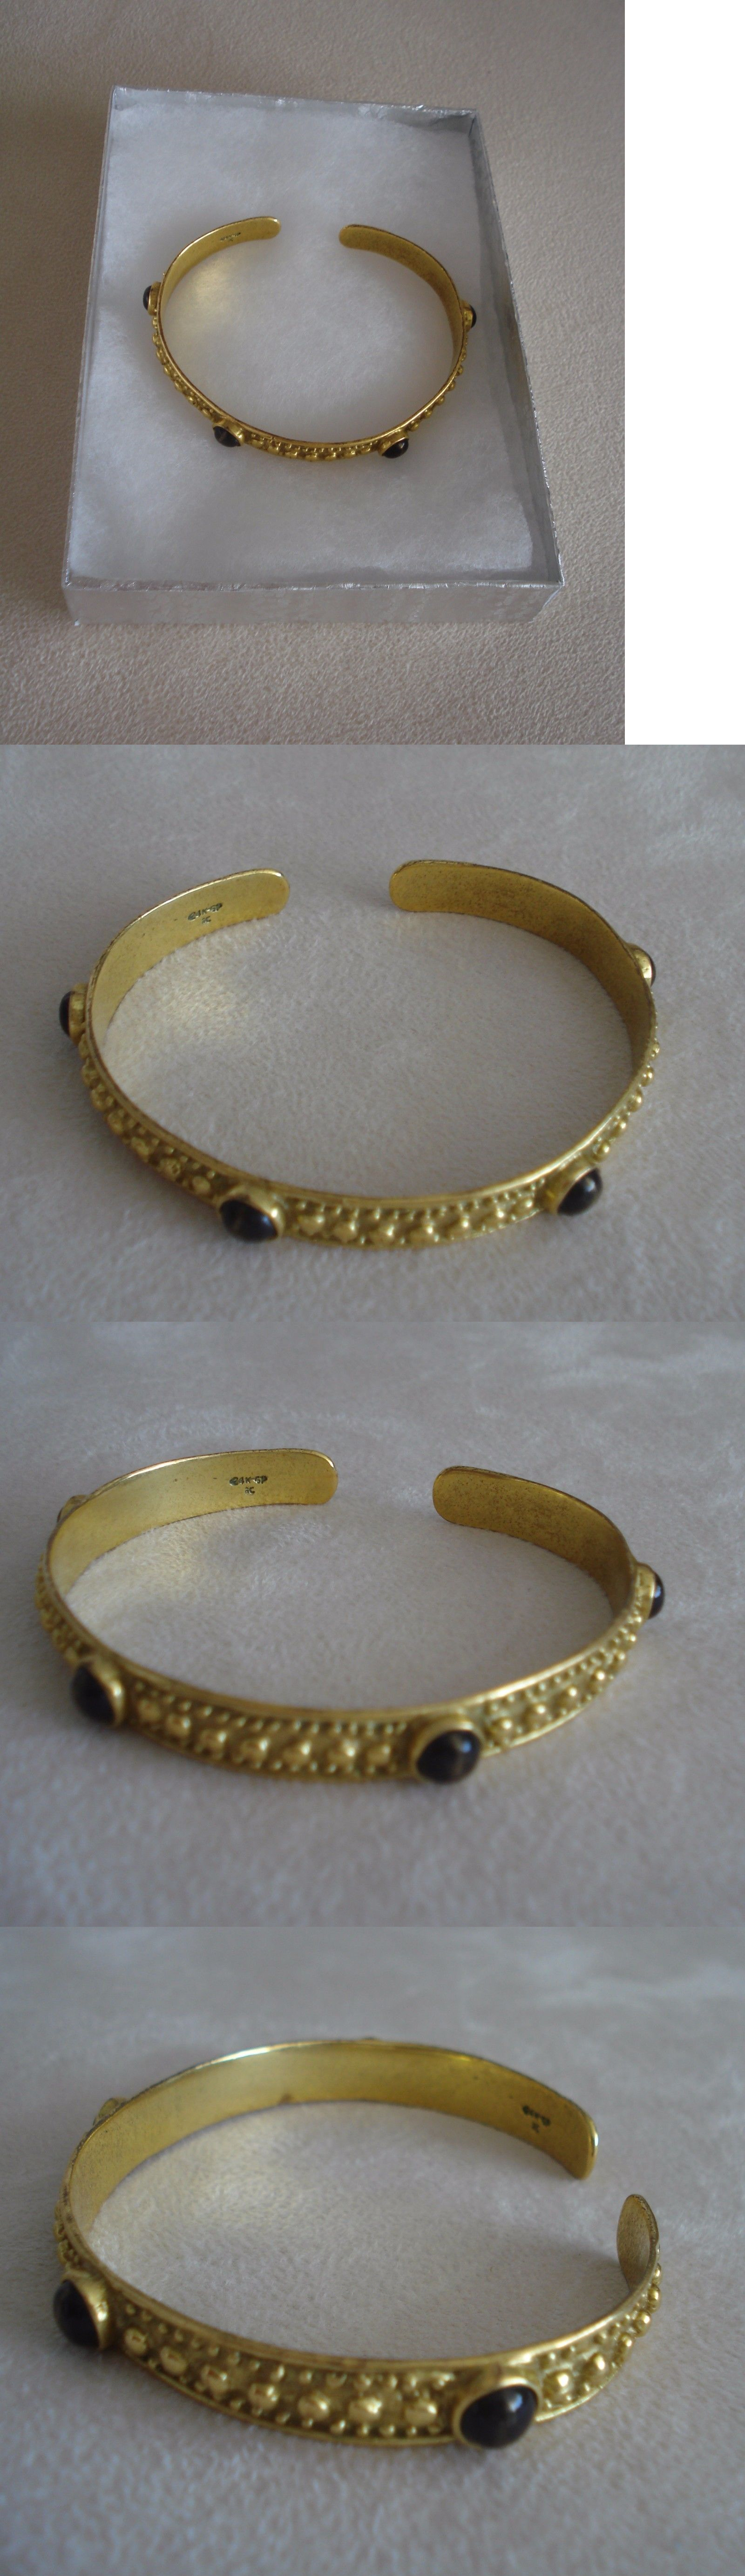 Bracelets 98504 Pre Columbian Replica Bracelet 24K Gold Pl W 4